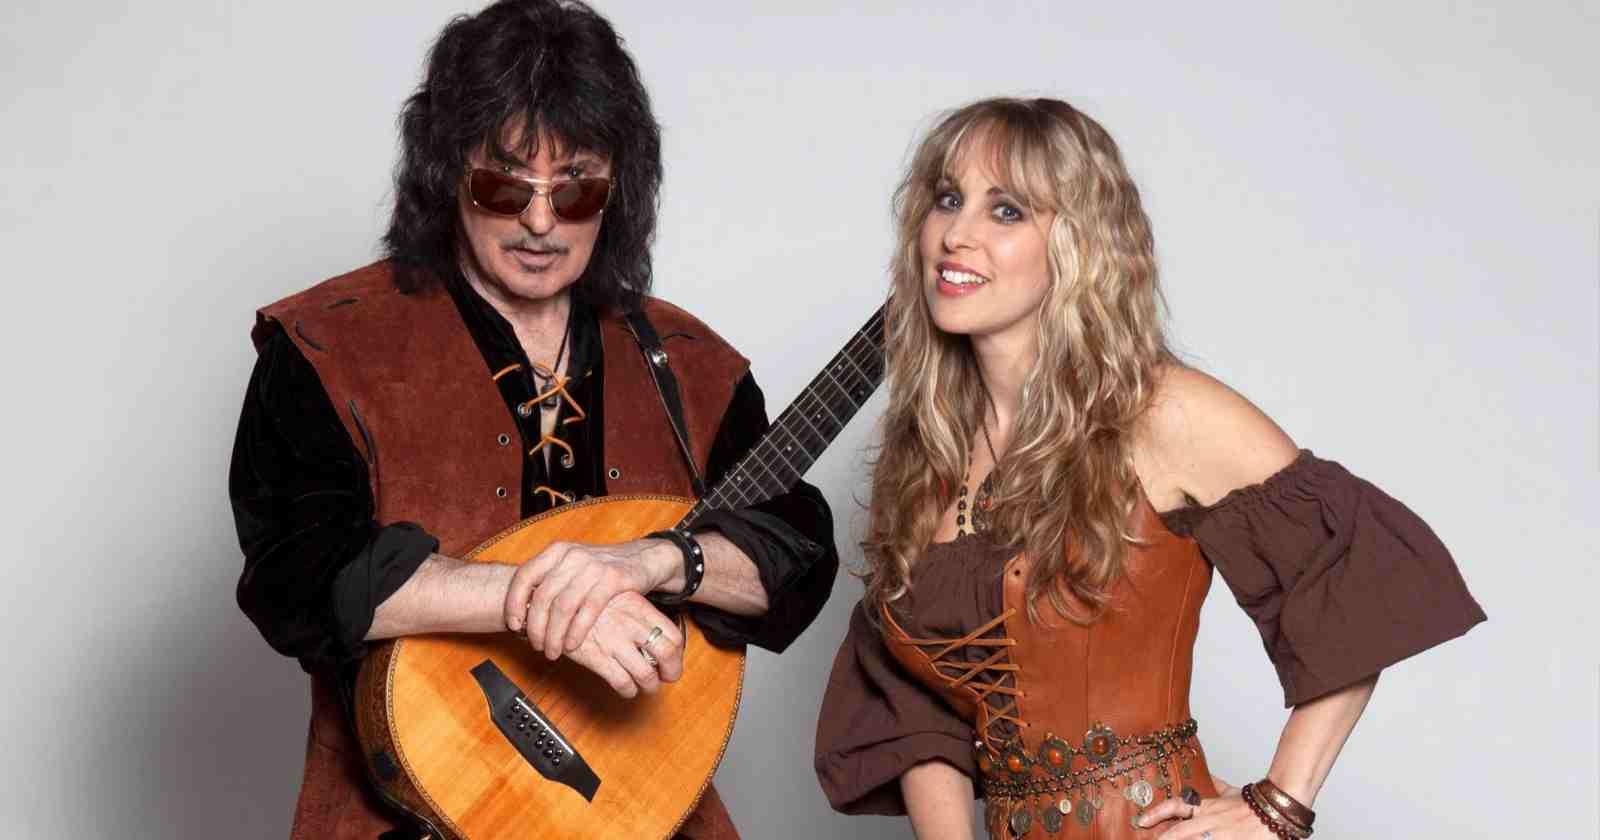 Ritchie Blackmore Candice Night